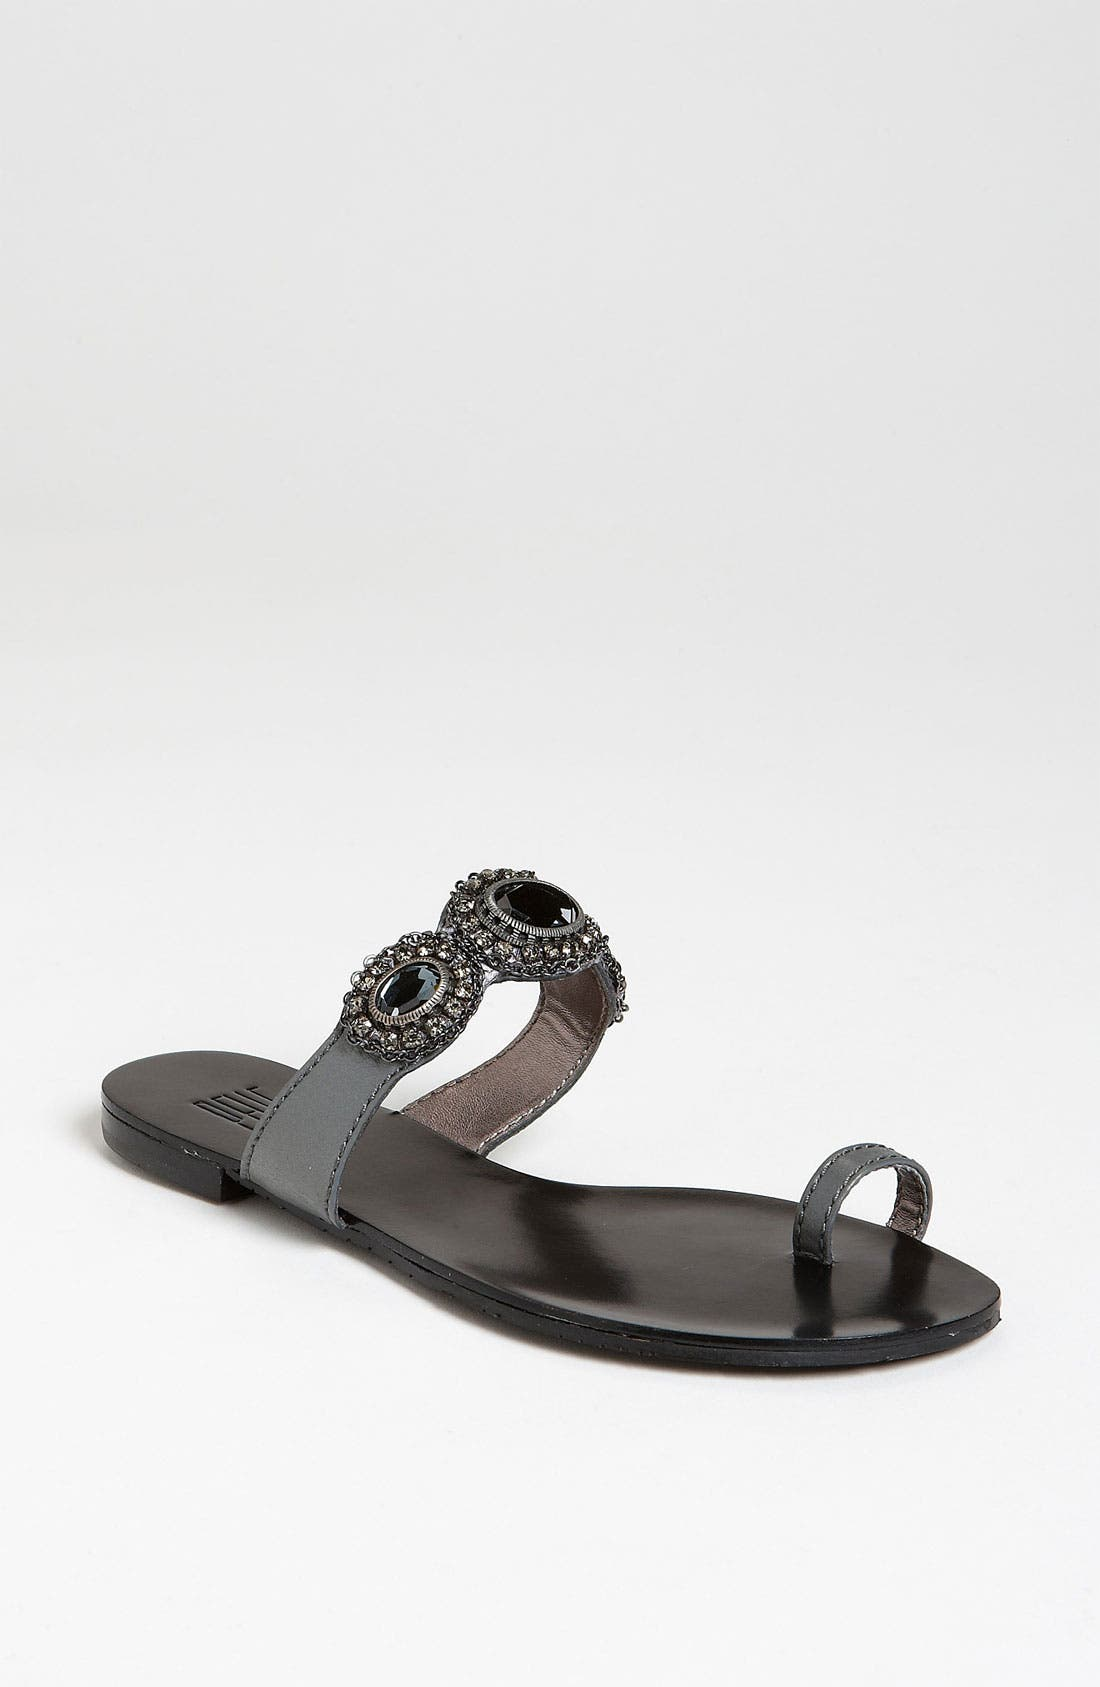 Alternate Image 1 Selected - Pelle Moda 'Hilda' Sandal